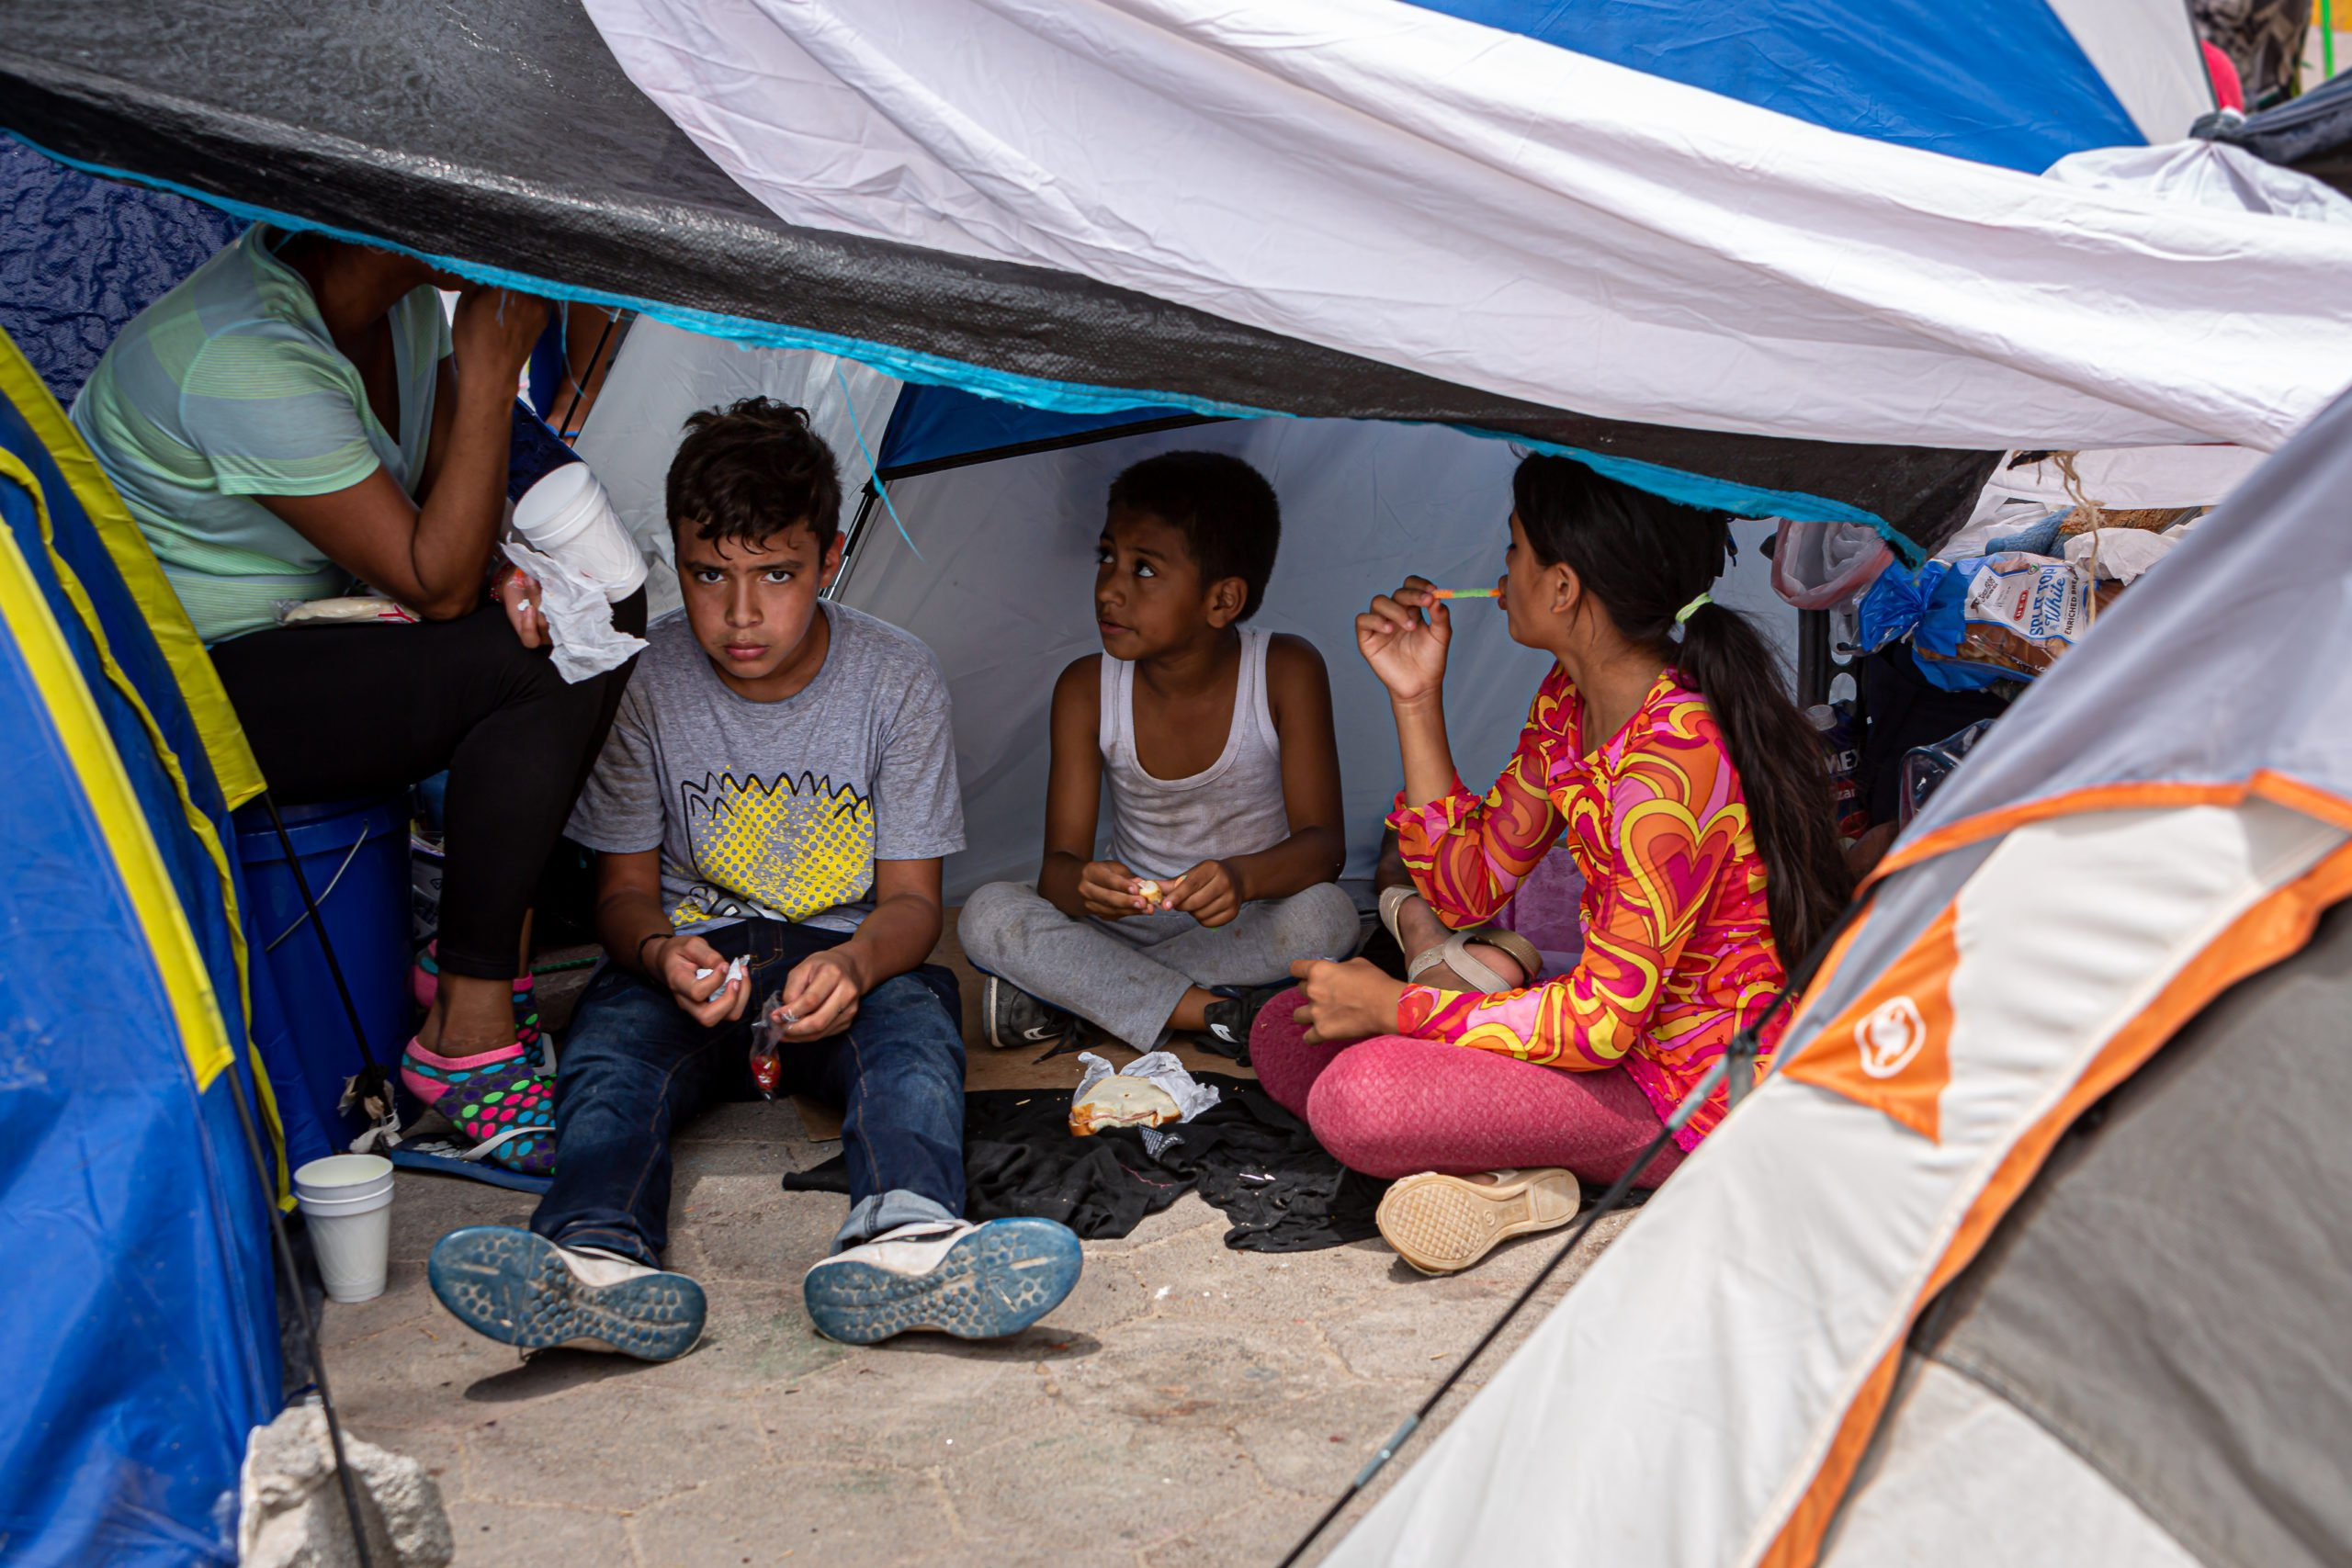 coronavirus - Usa - Trump - scorciatoia - migranti